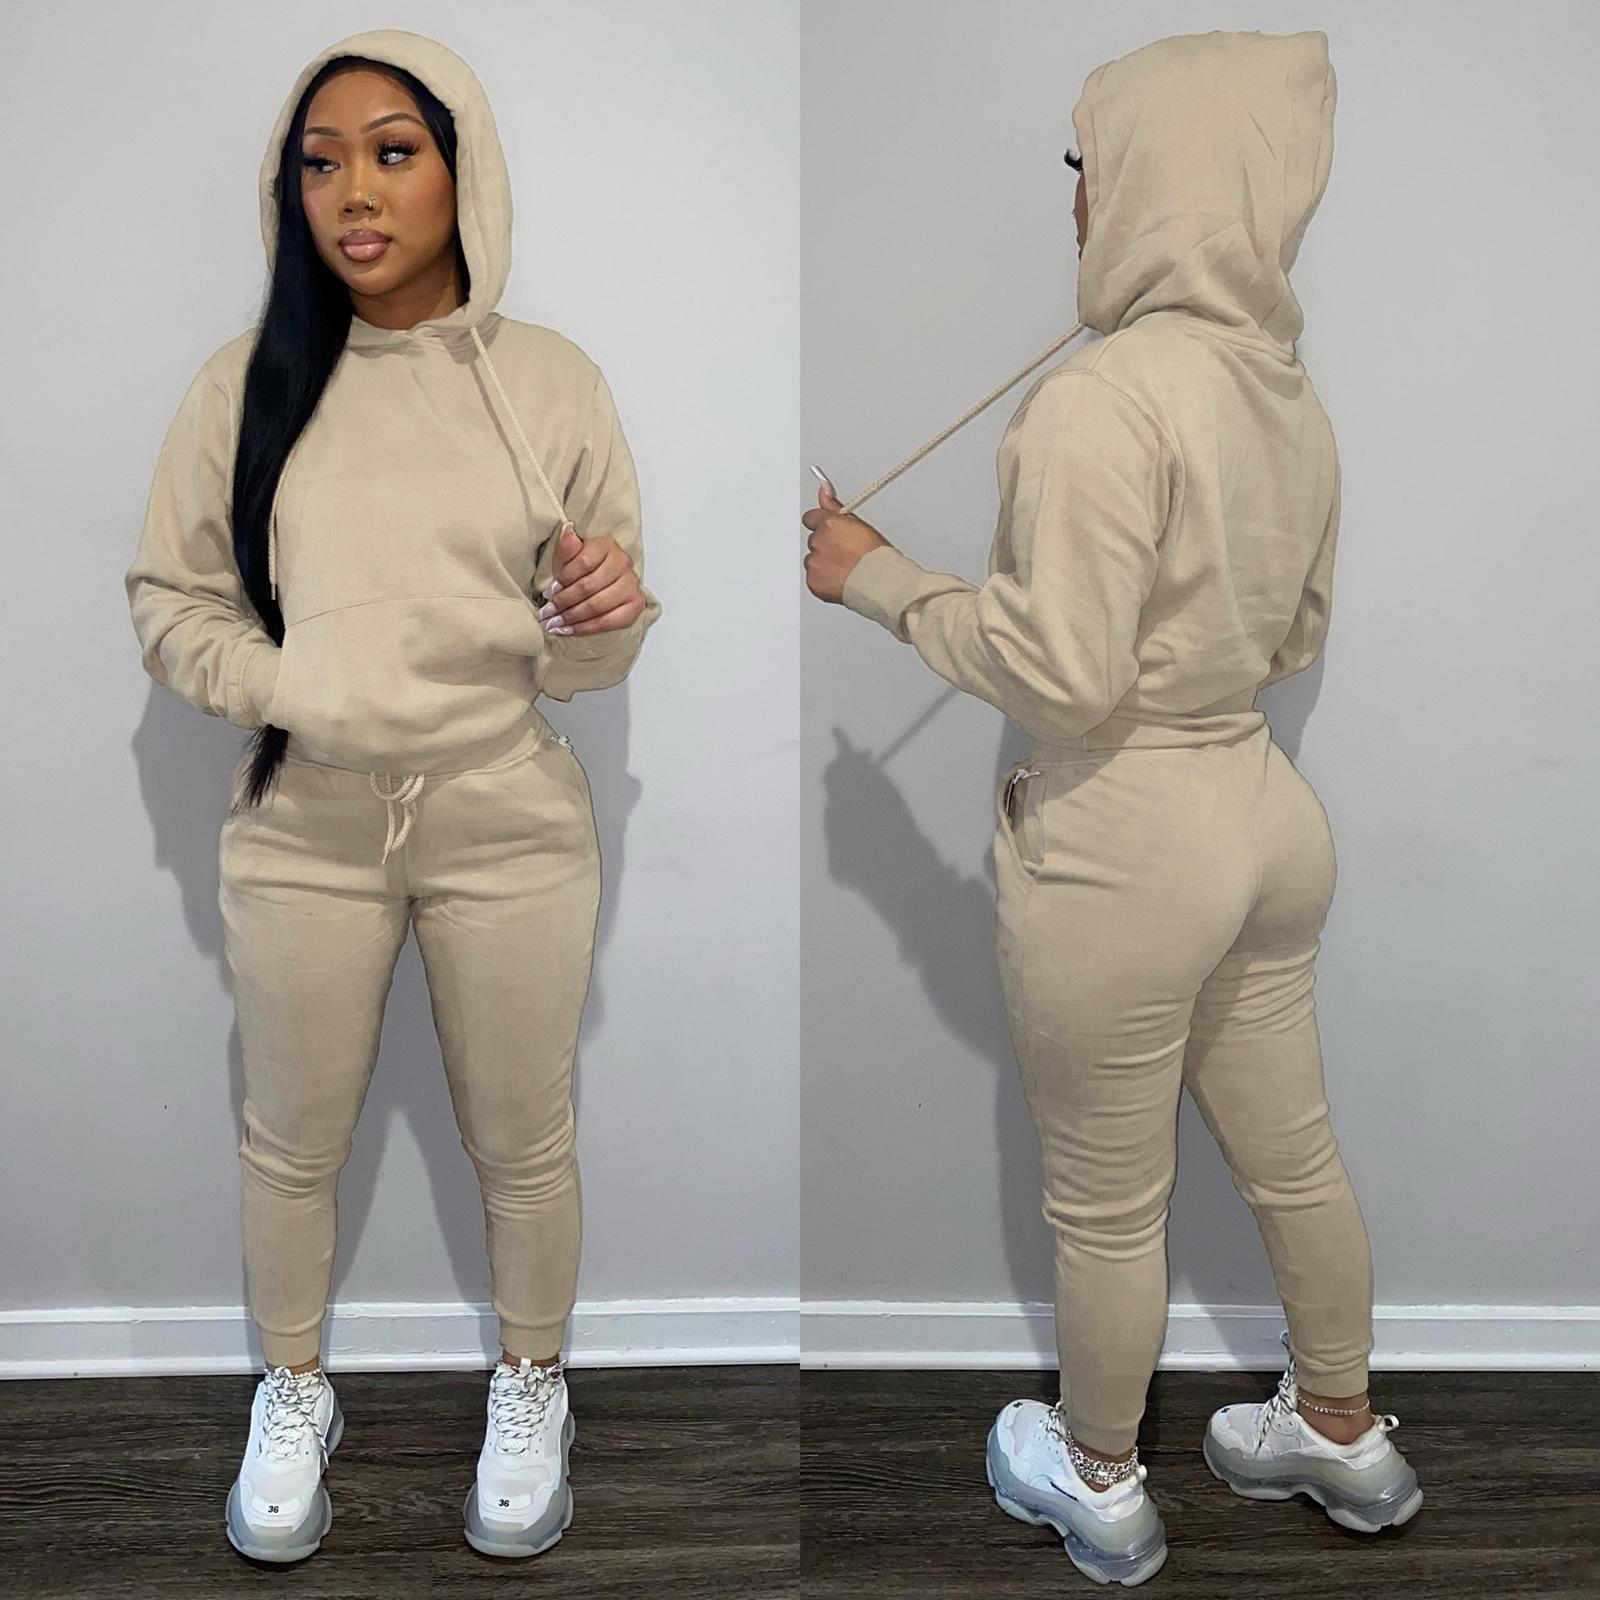 Fall 2021 Women Clothes zipper Hoodie Set 2 Piece Set Hoodies Joggers Long Sleeve Sweatsuit Tracksuit Two Piece Jogger Set